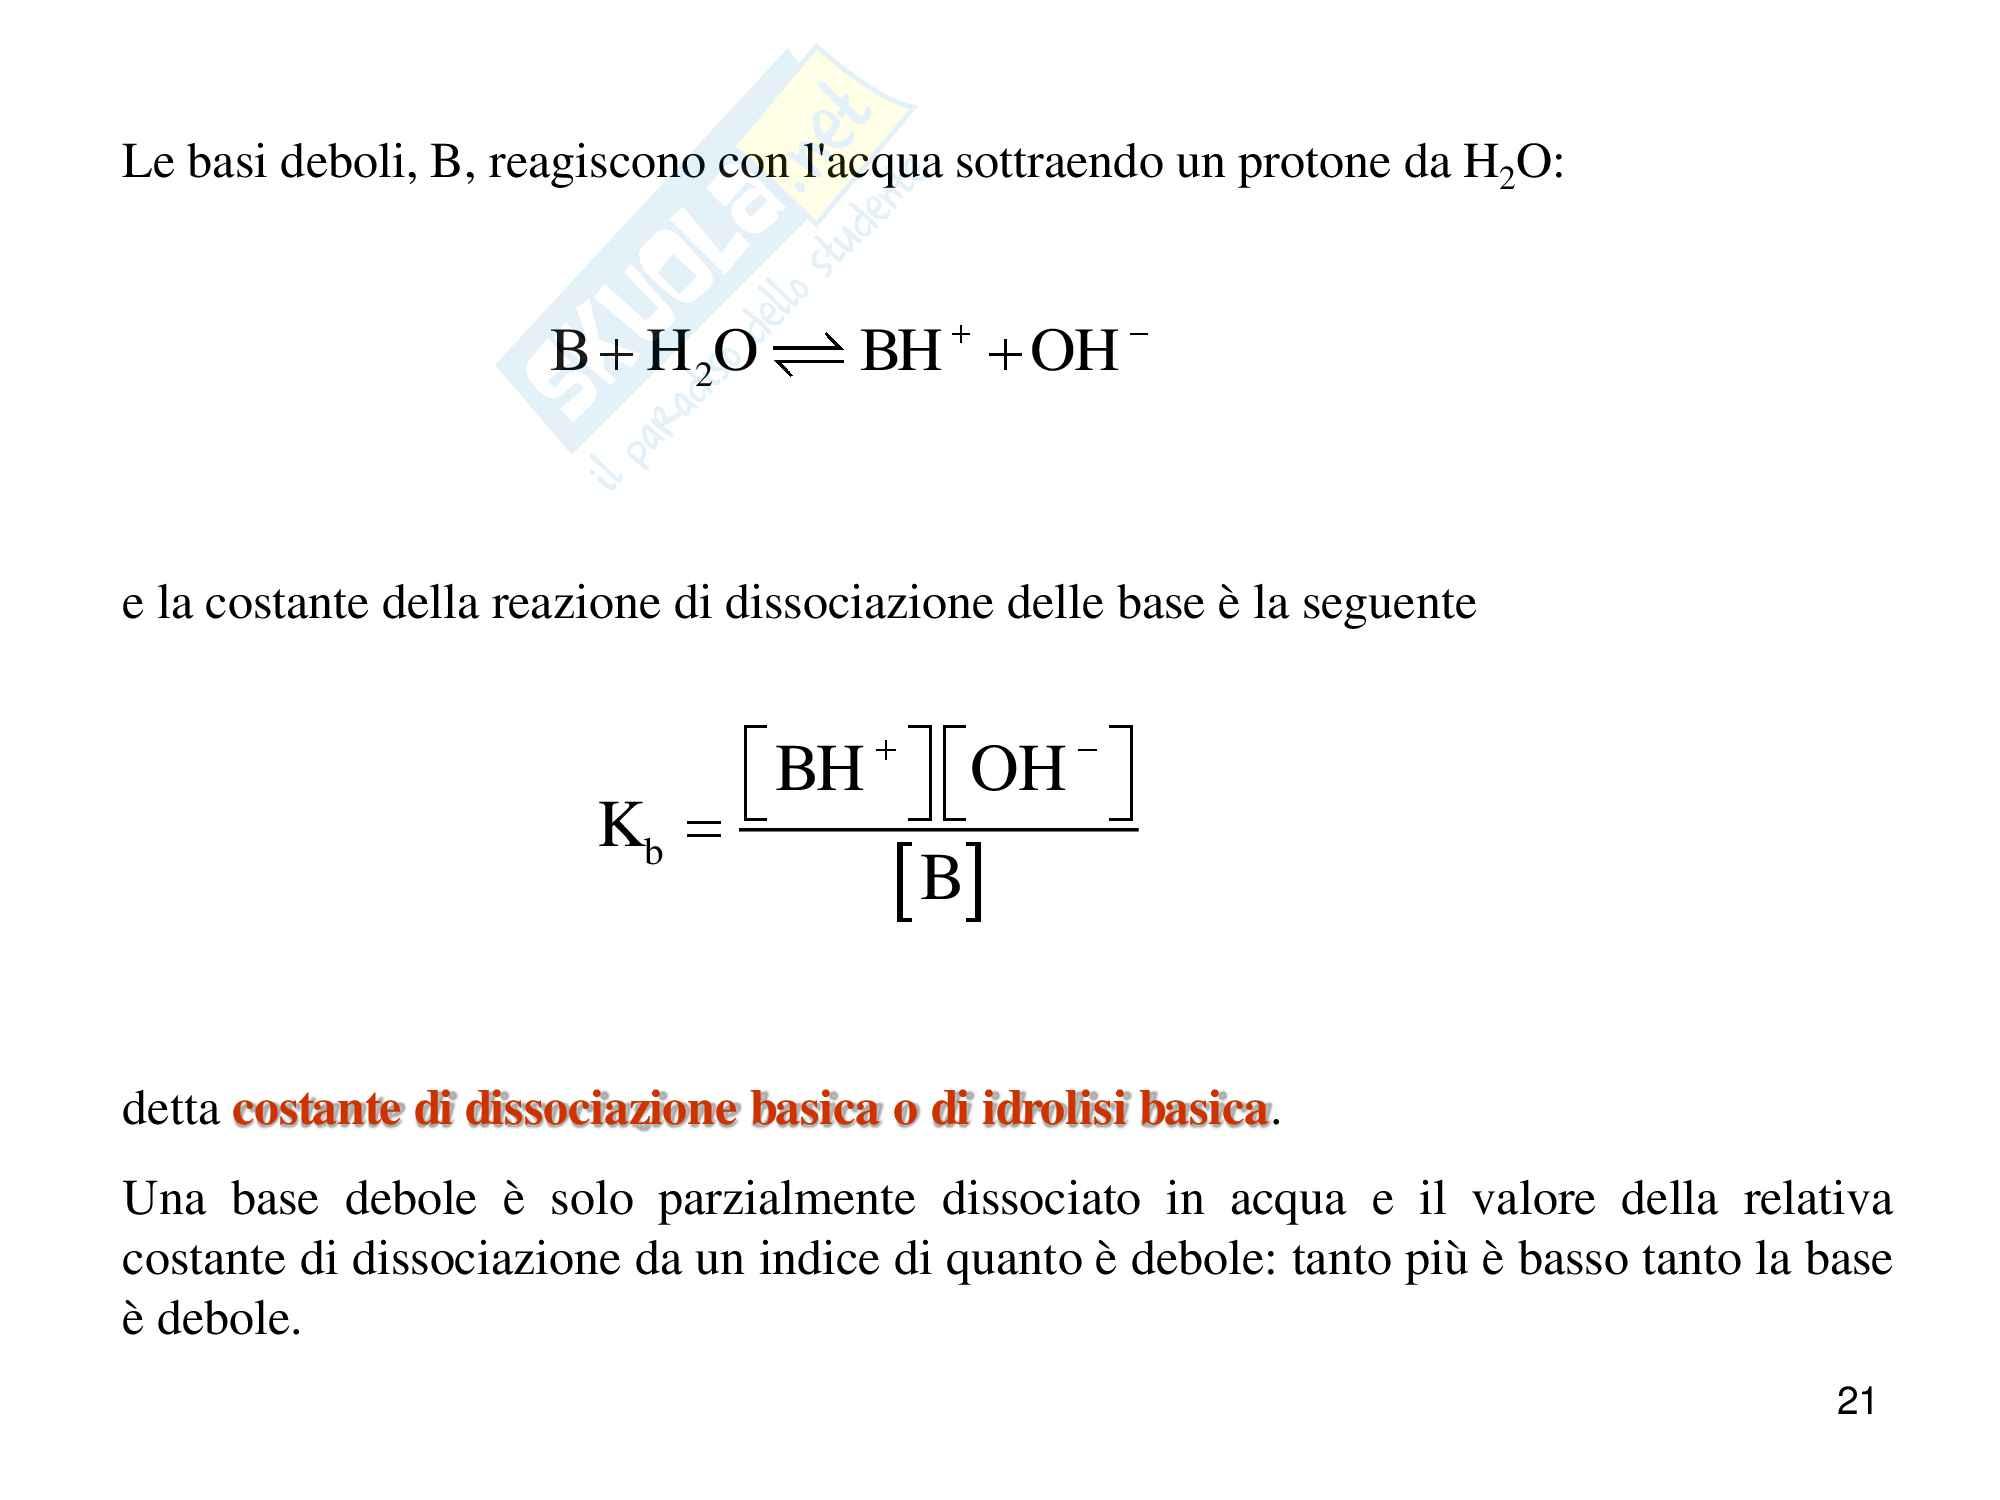 Chimica analitica, equilibrio acido base Pag. 21